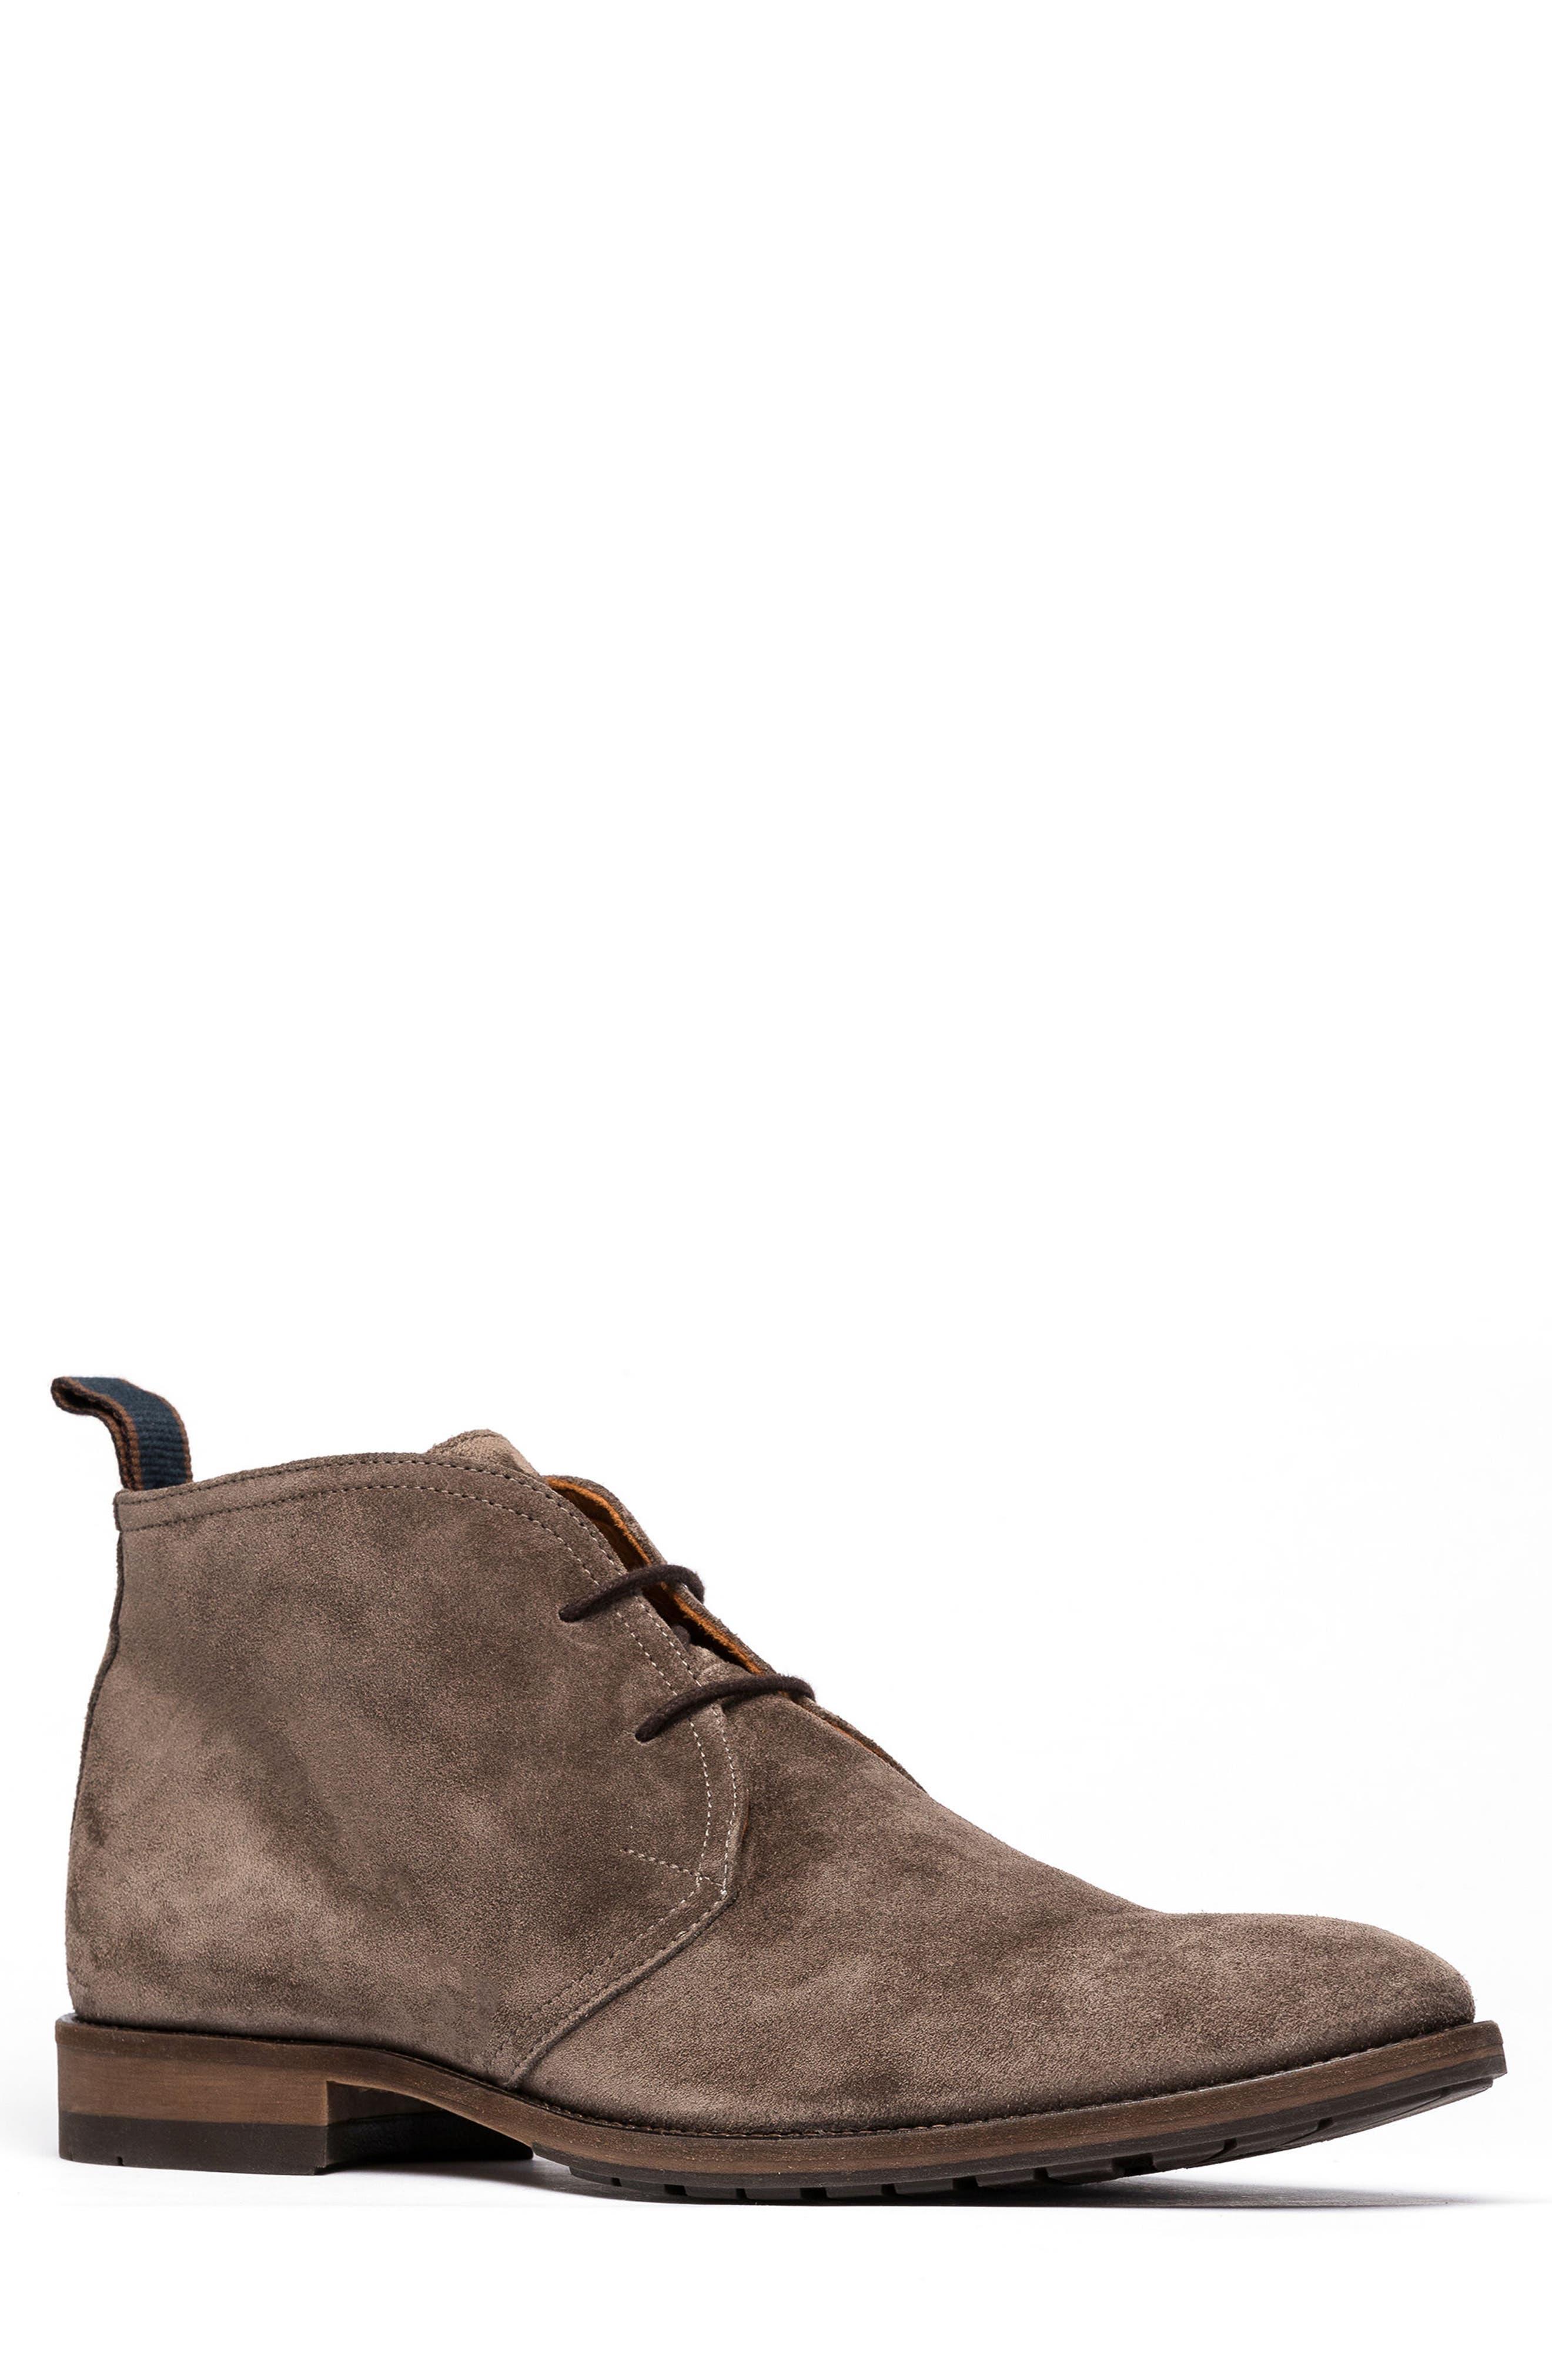 Rodd \u0026 Gunn Pebbly Hill Chukka Boot